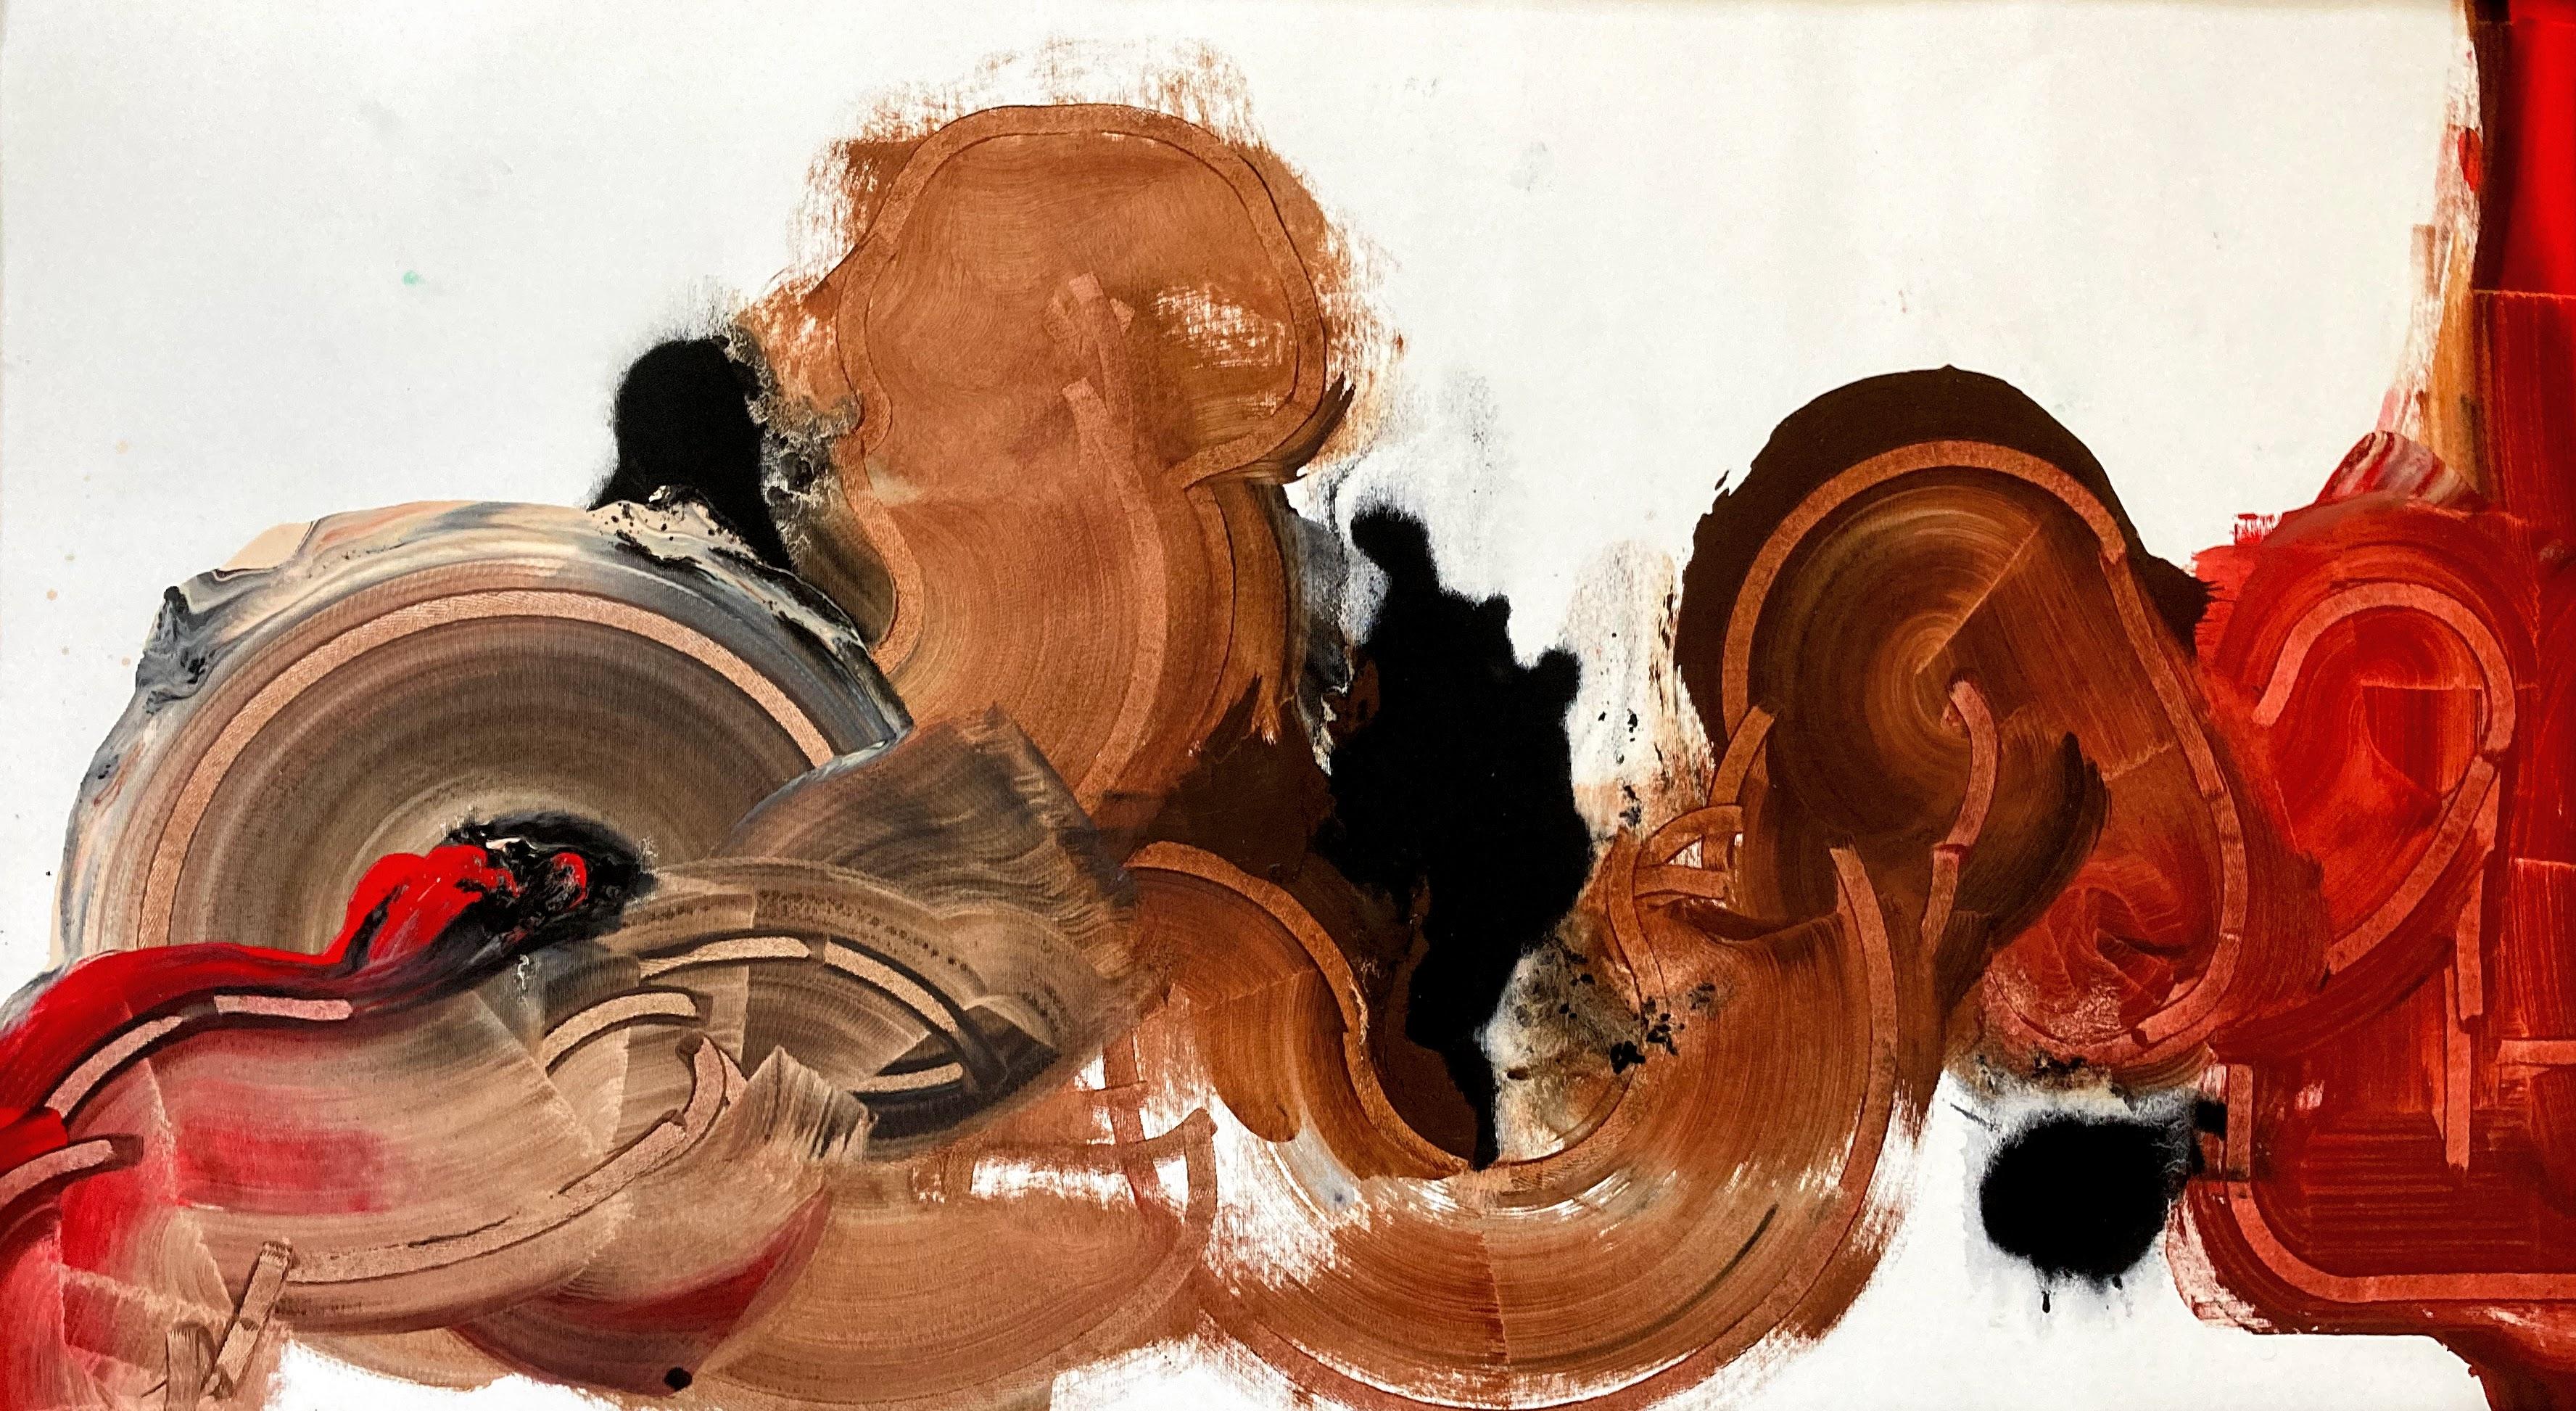 Addie Wagenknecht, Self Portrait Reclined, Kosmetik-Pigmente, Anti-Aging Gel, Chanel No 5 Perfüm, Prozac mit Ölmedium auf Leinwand, 140 x 82 cm, 2020